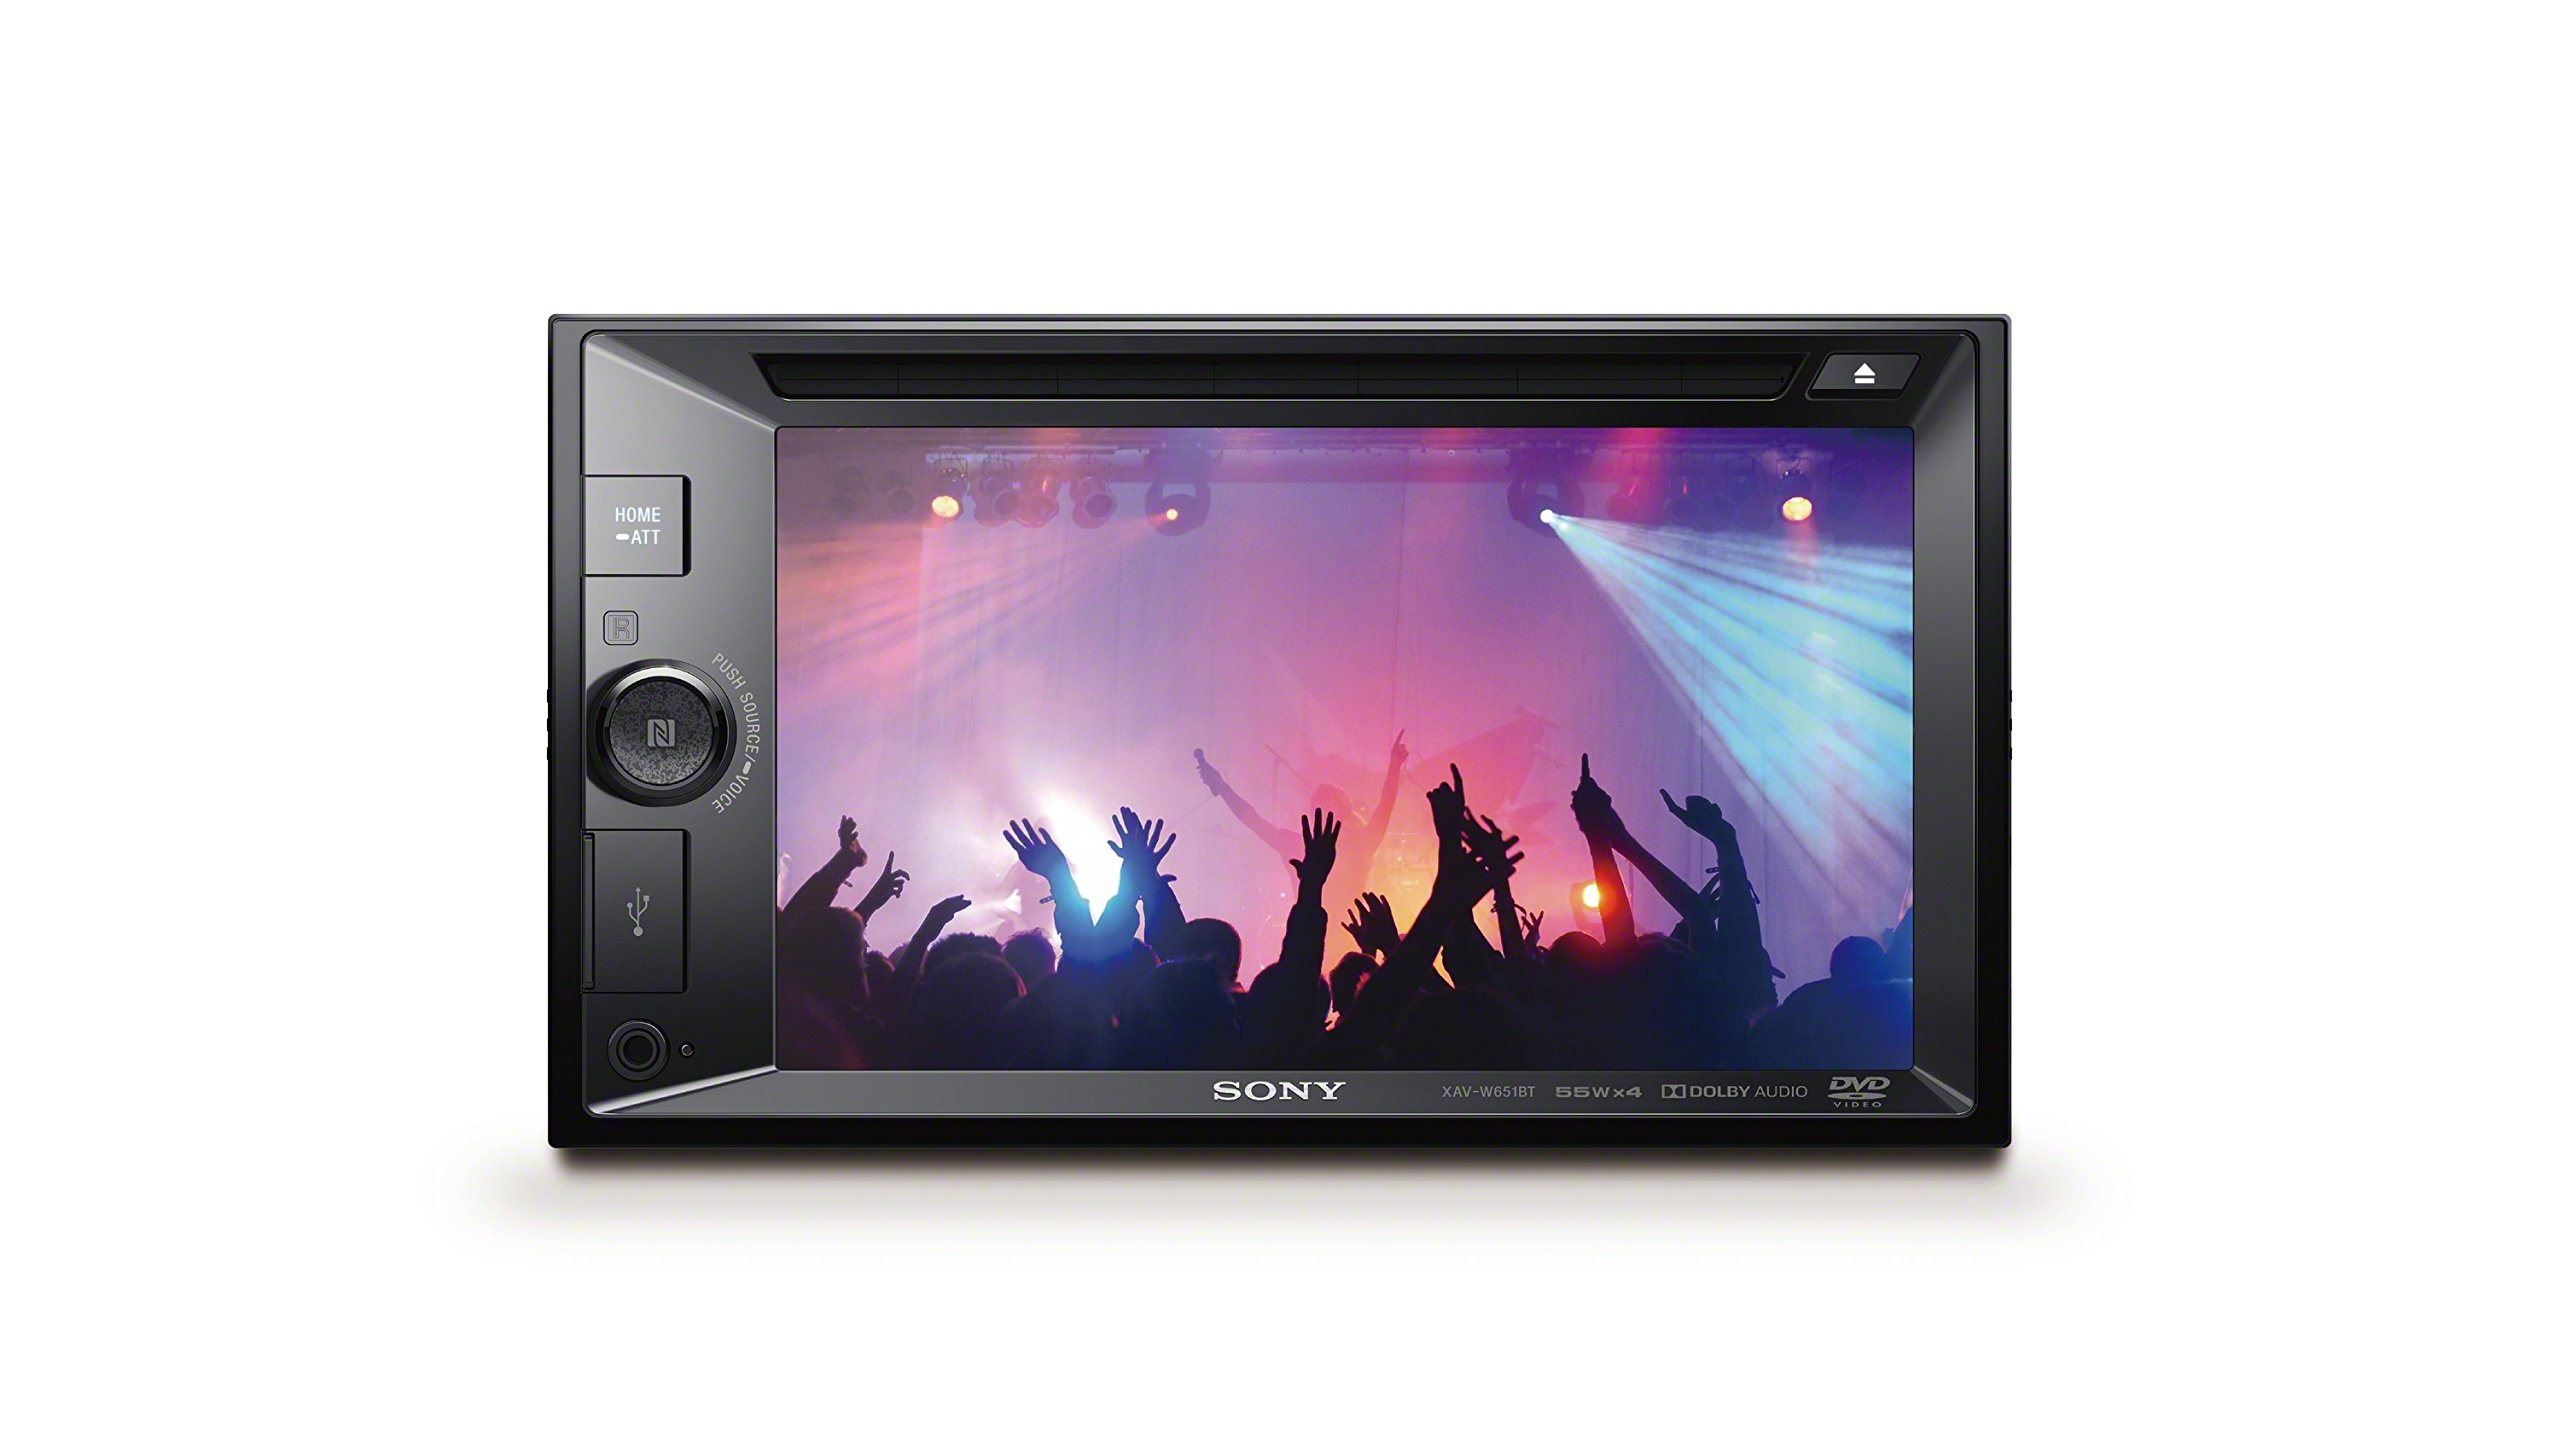 Sony XAV-W651BT 6.2 Inch LCD DVD Receiver by Sony (Image #1)